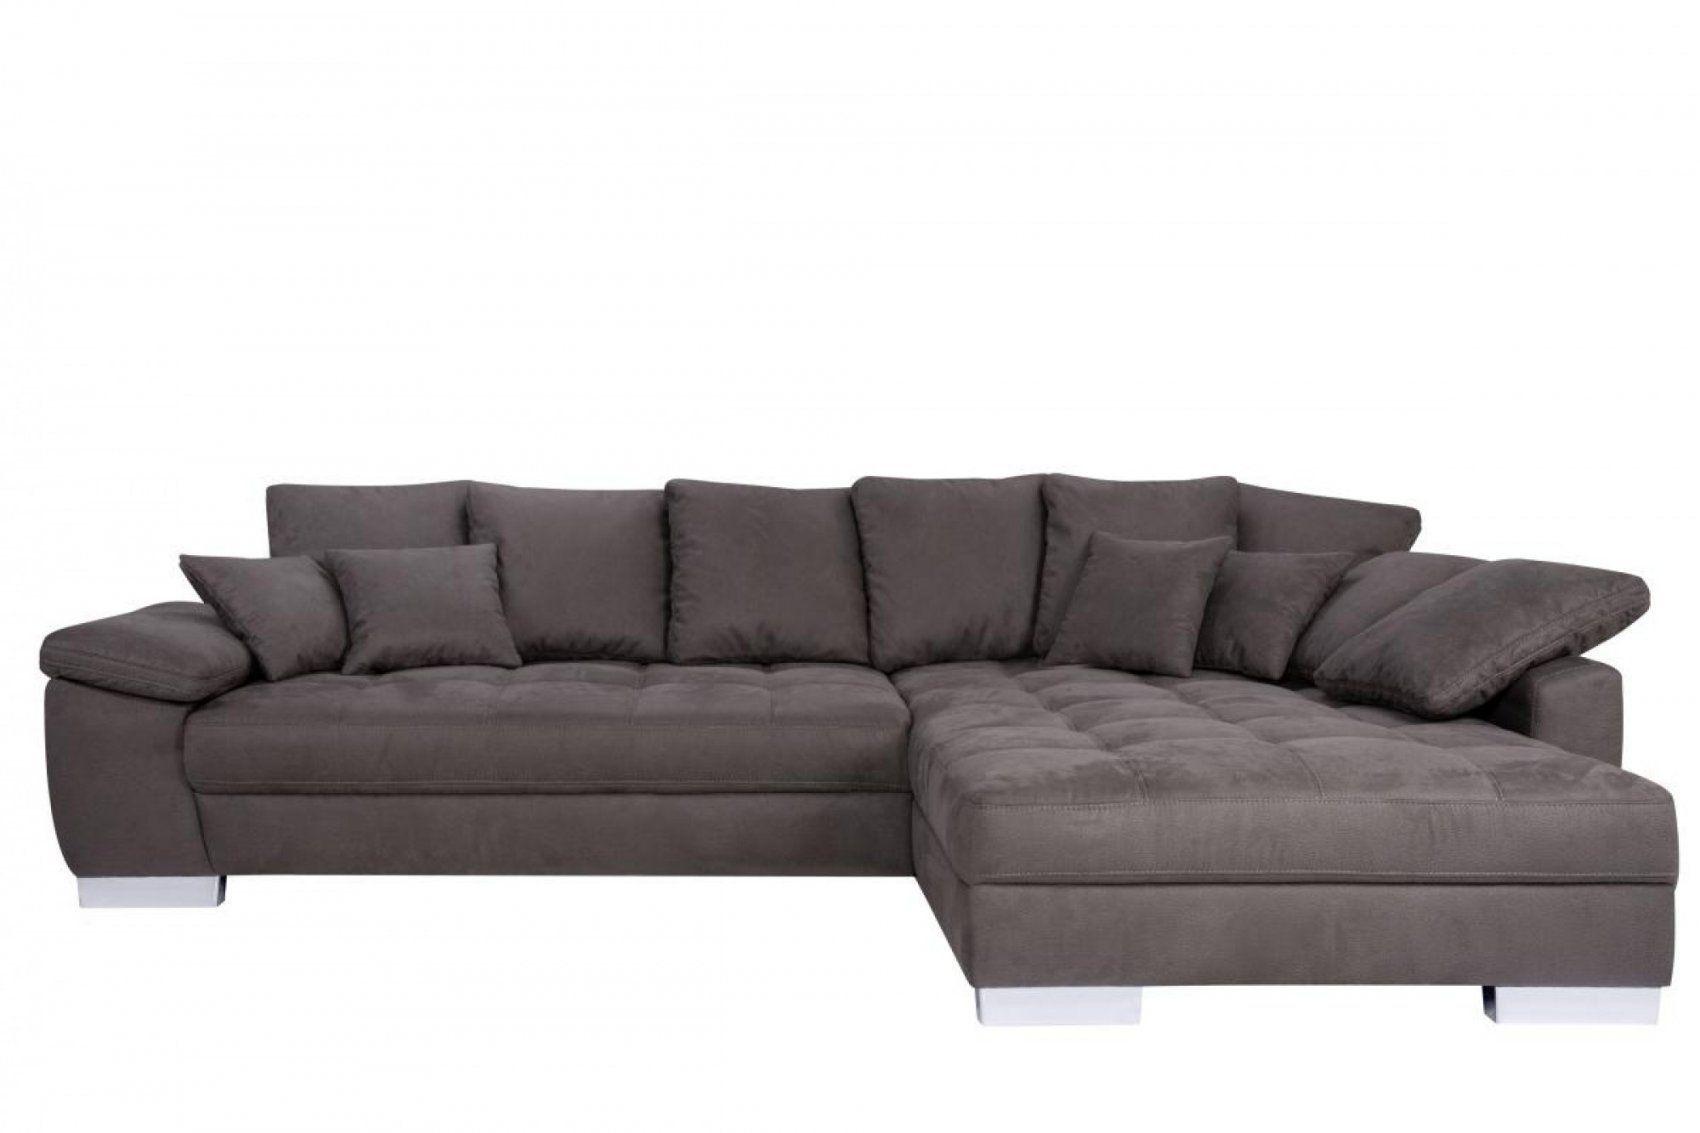 Big Sofa Poco Domane Grosse Sofas Sofa Warme Brauntone